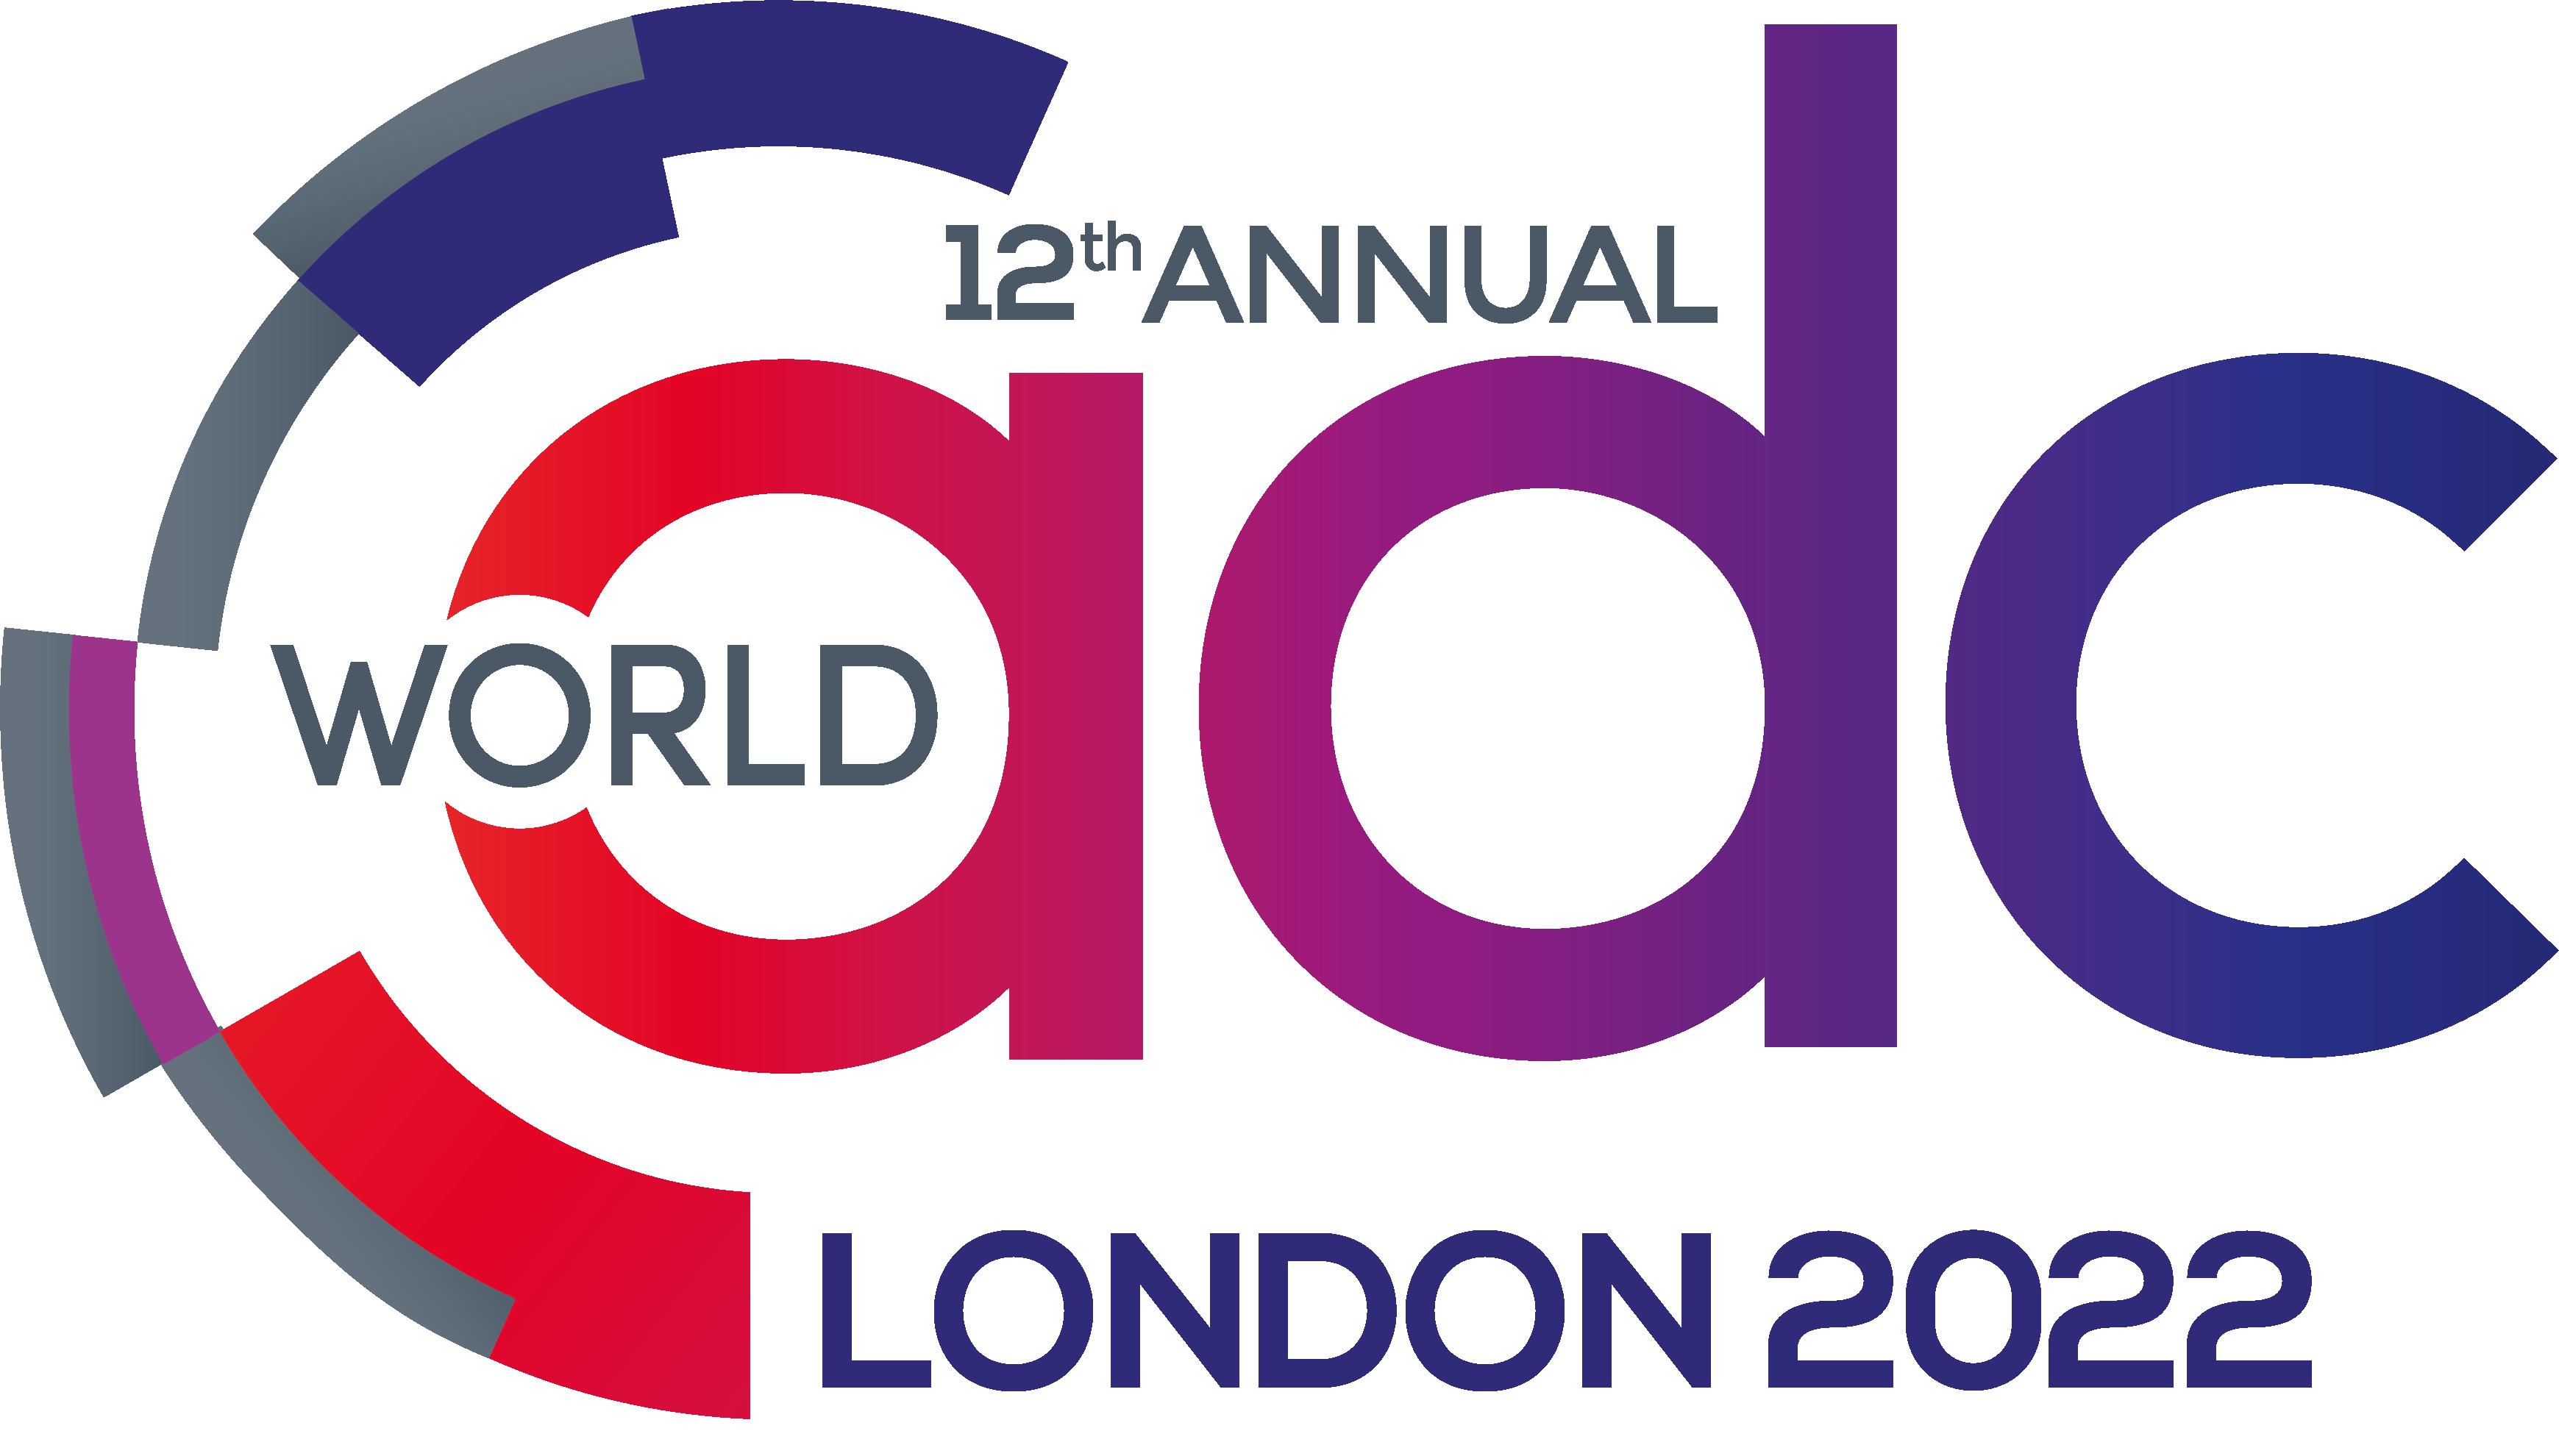 HW210721 World ADC London 2022 logo